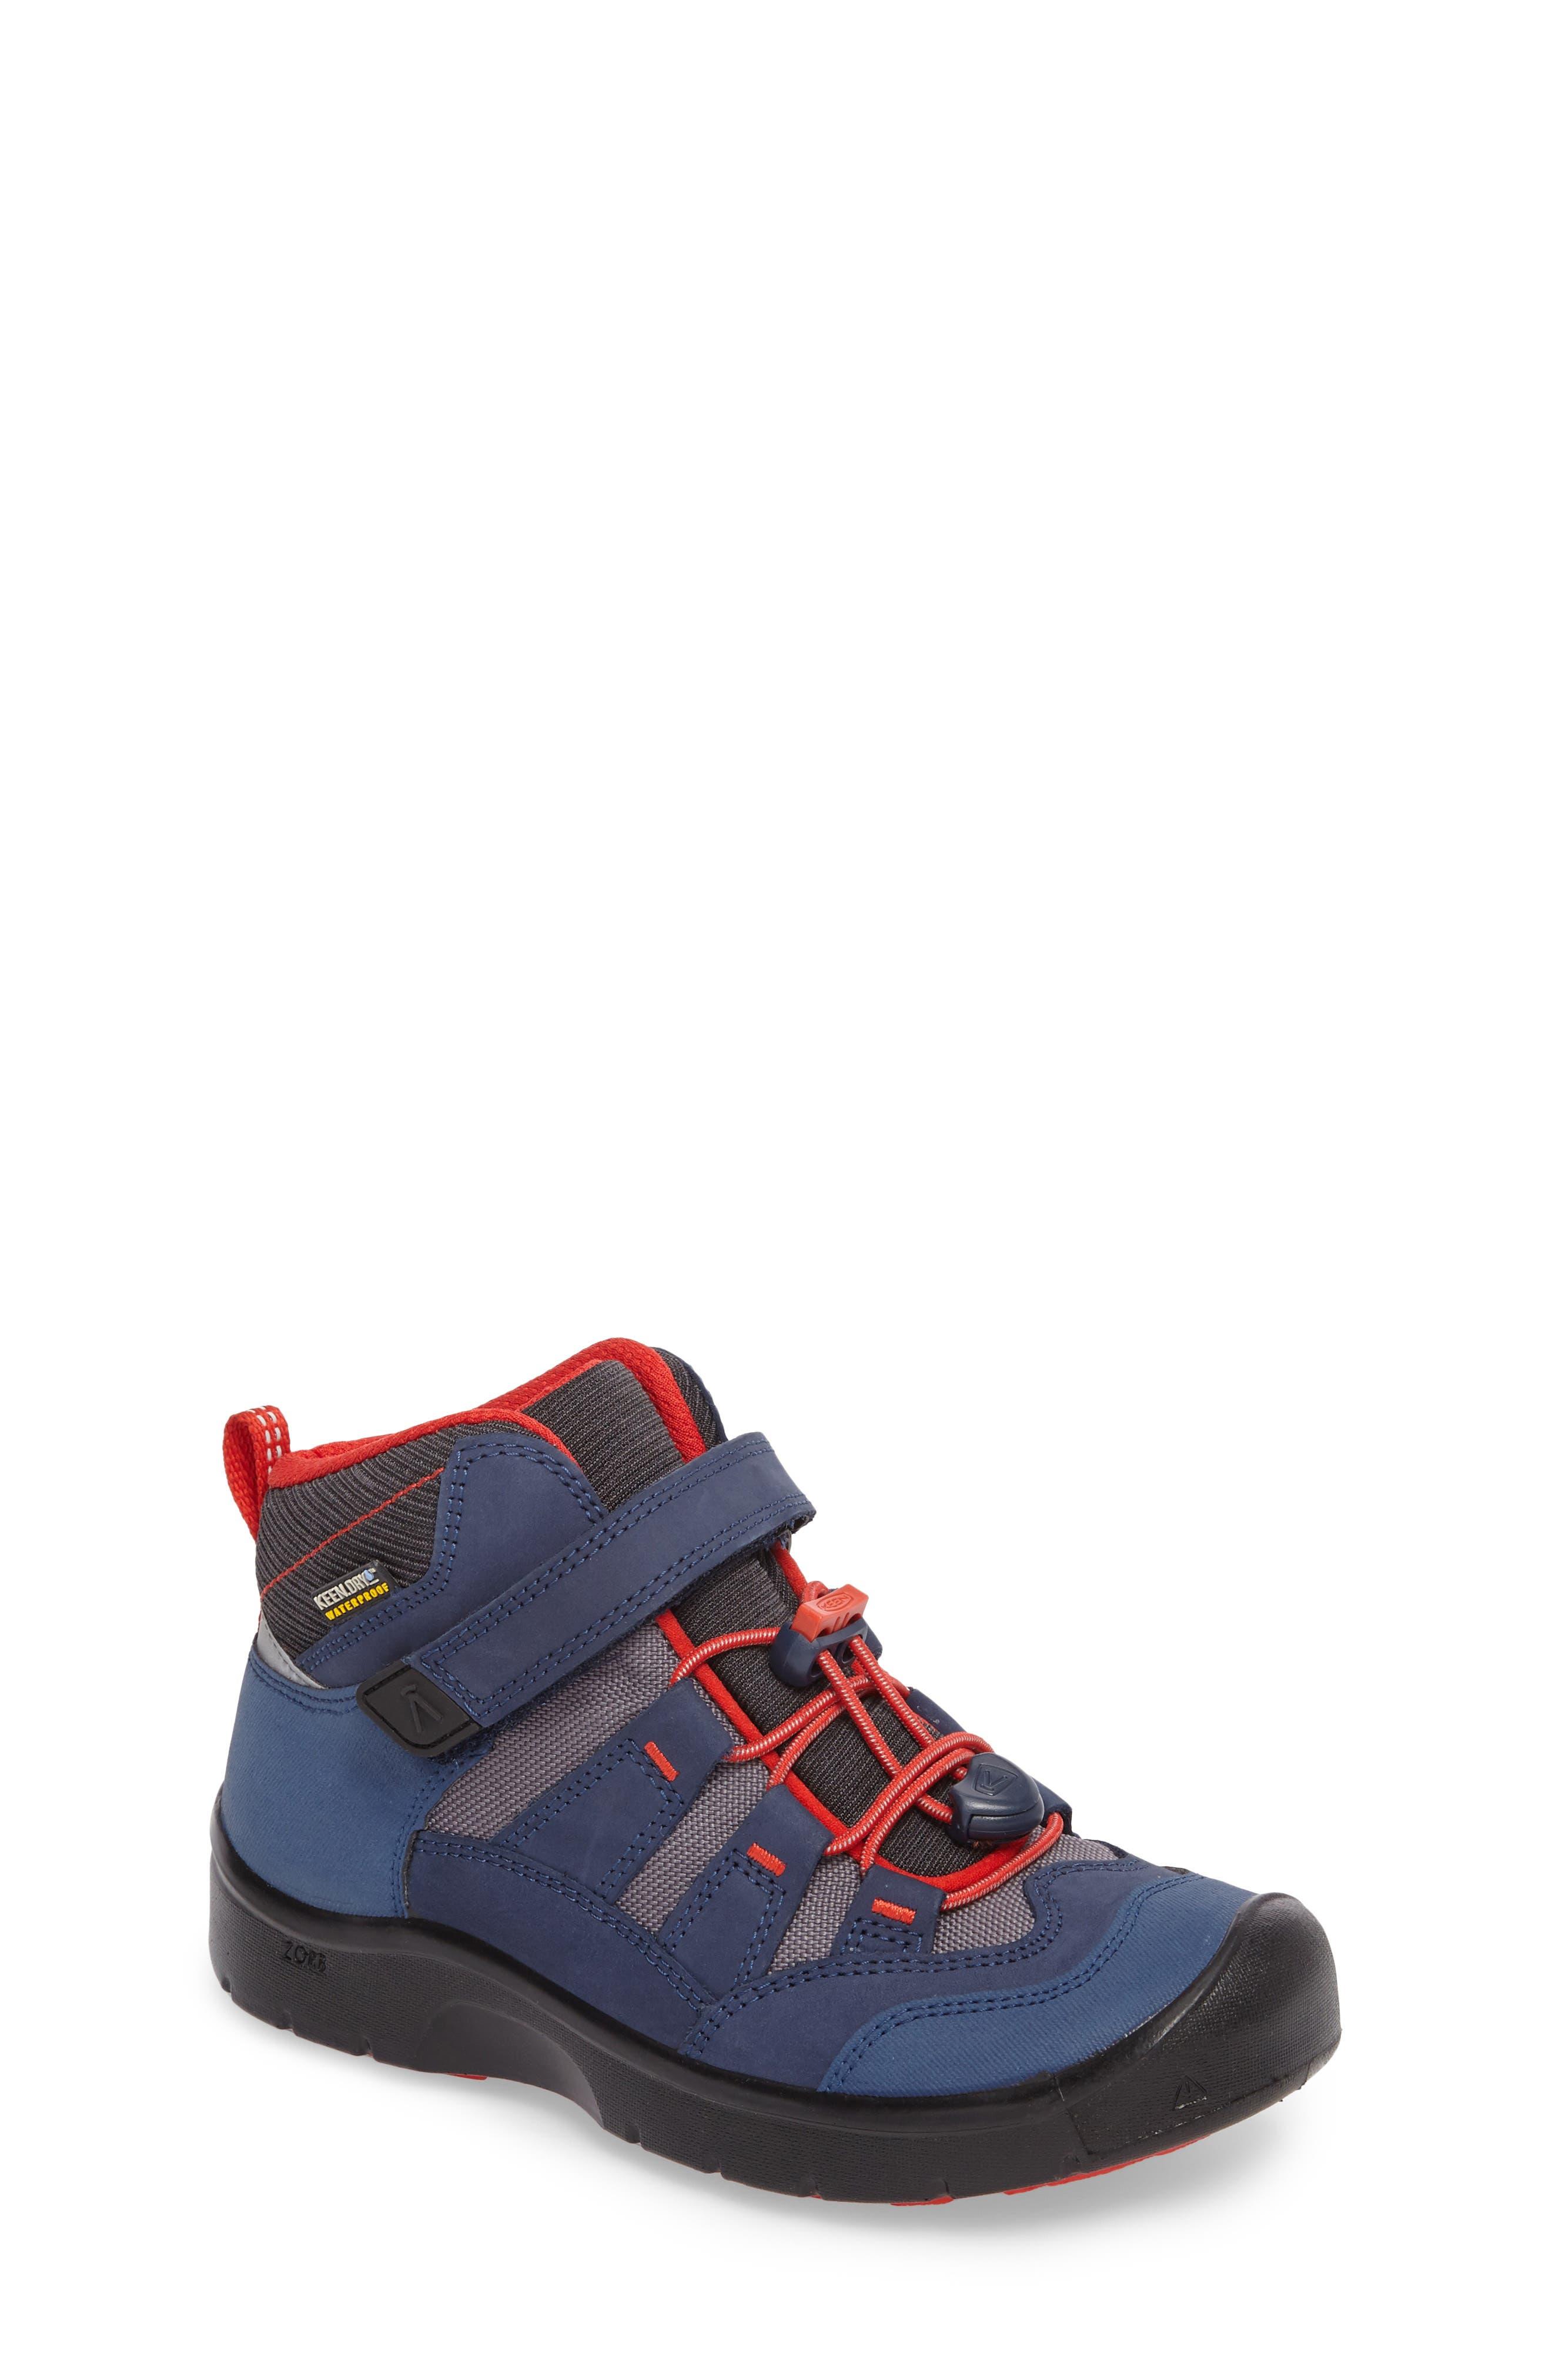 Hikeport Strap Waterproof Mid Boot,                             Main thumbnail 3, color,